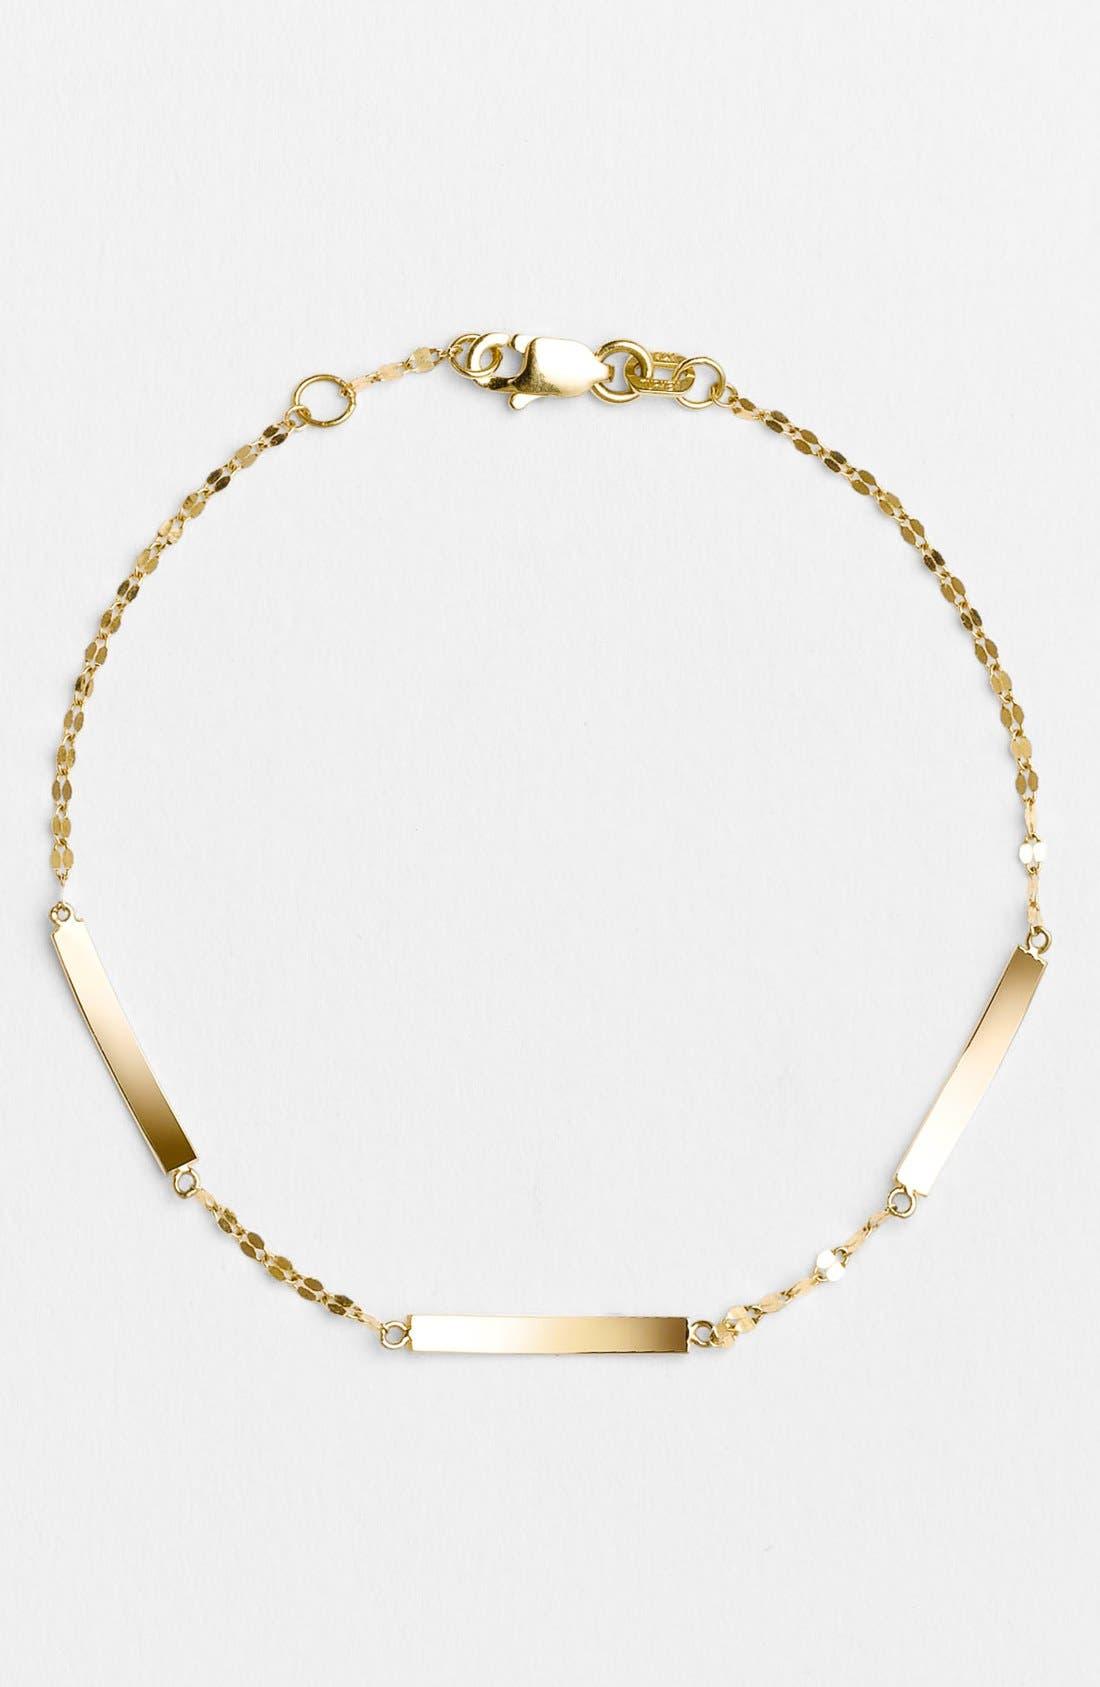 Main Image - Lana Jewelry Bar Station Bracelet